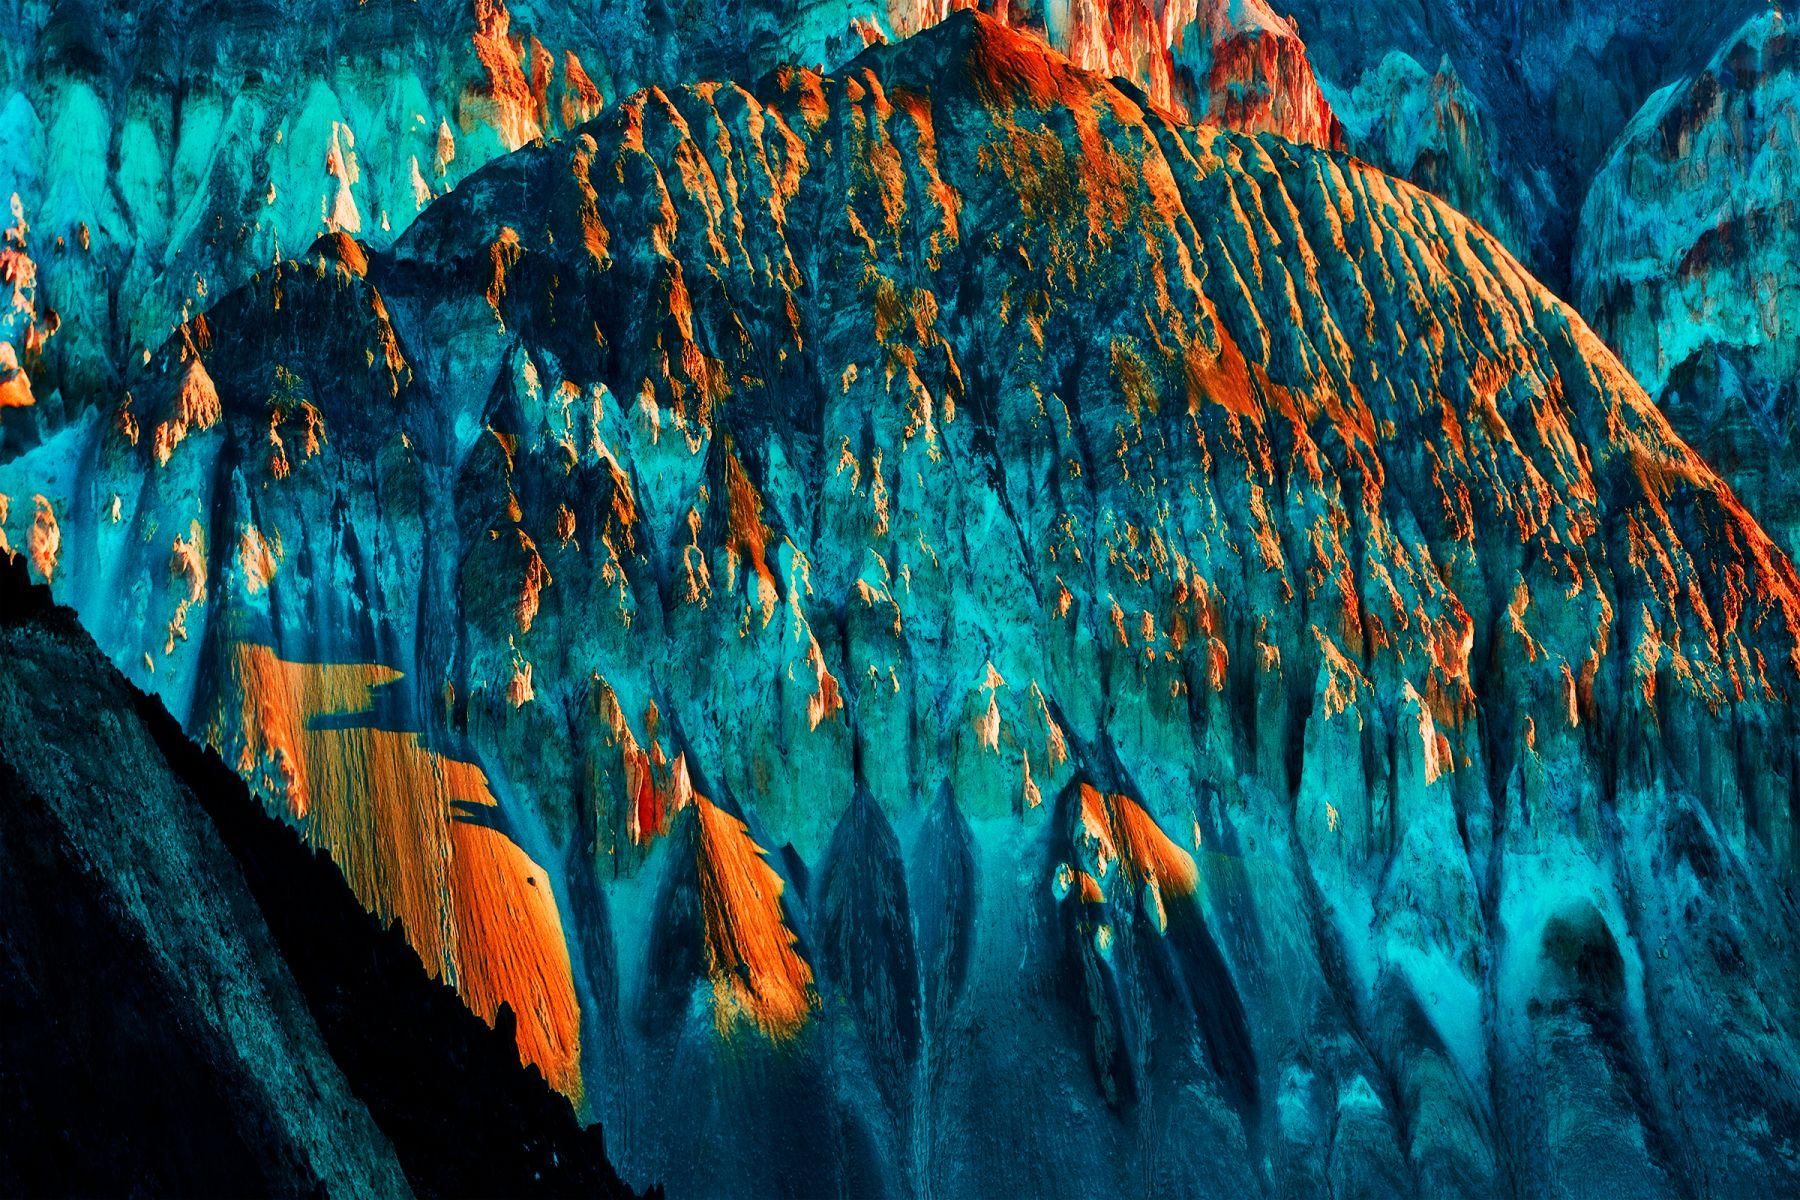 An Iridescent, a Bizarre and Subterranean Light, California, 2017